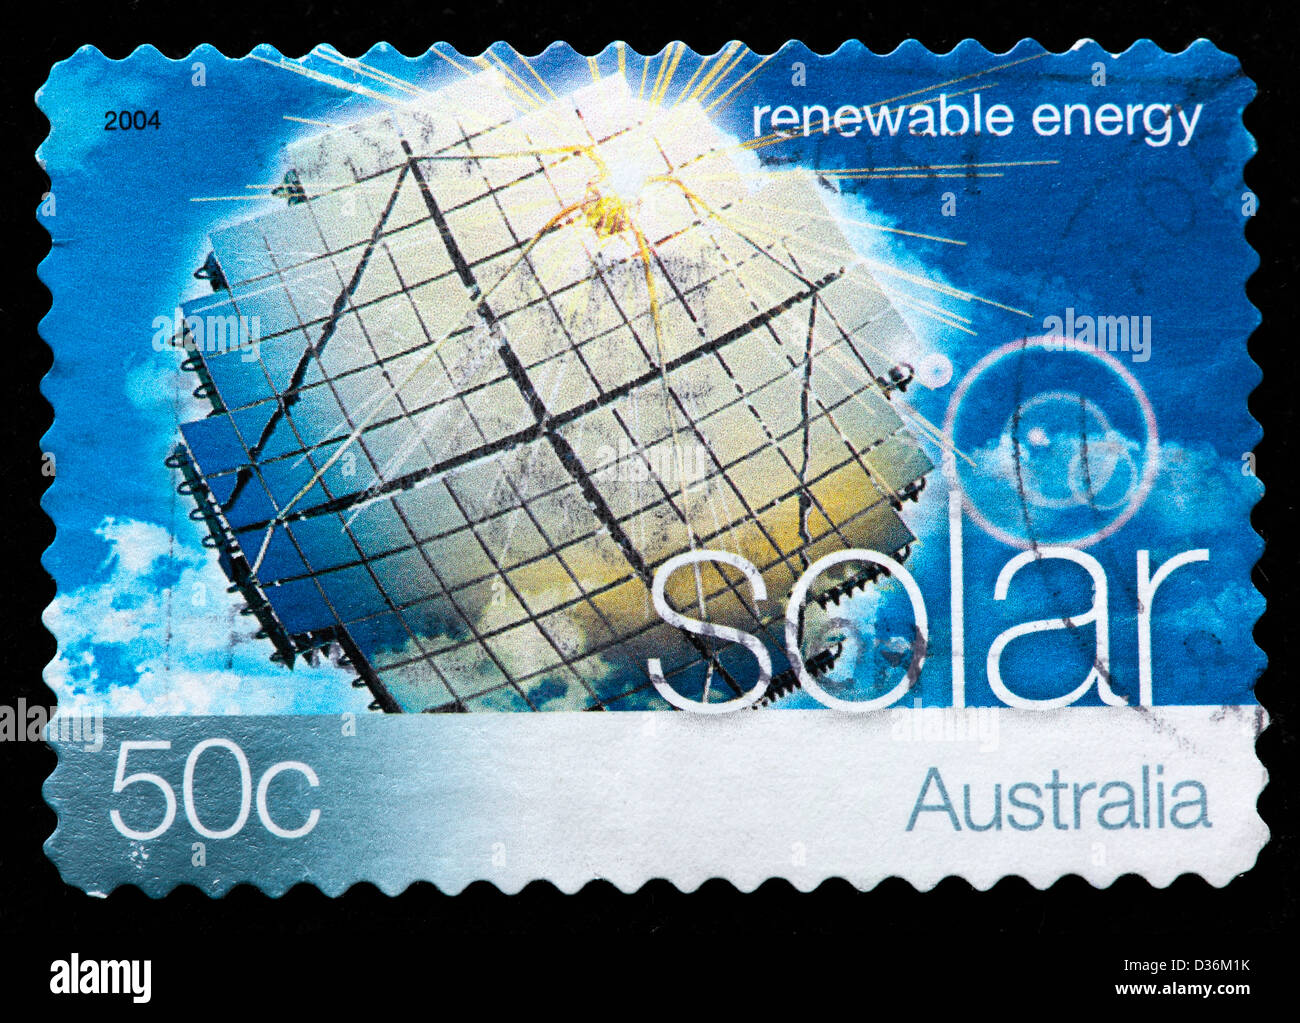 Solar, Renewable energy, postage stamp, Australia, 2004 - Stock Image